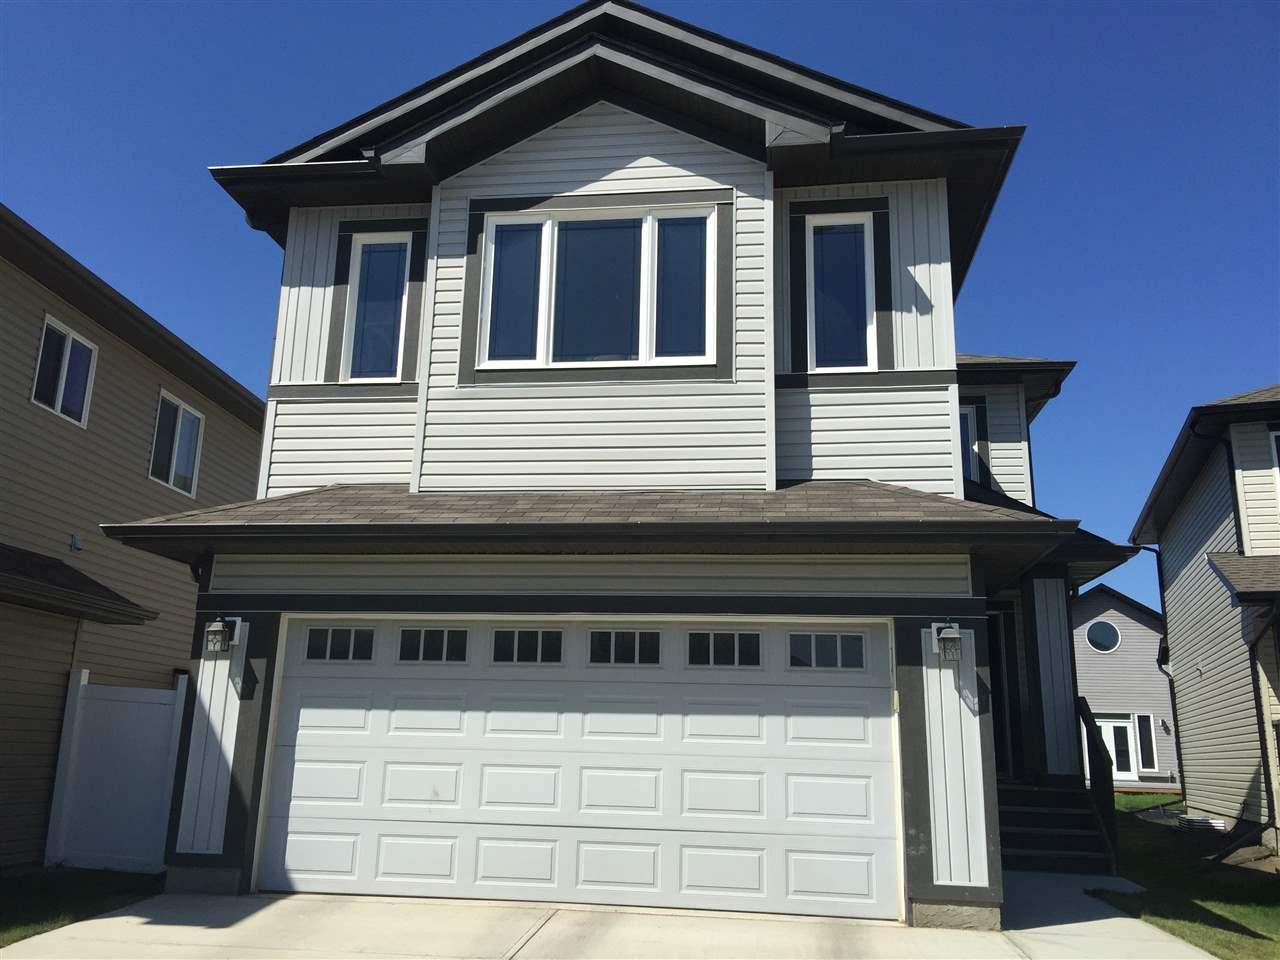 17163 123 street edmonton for sale 478 000